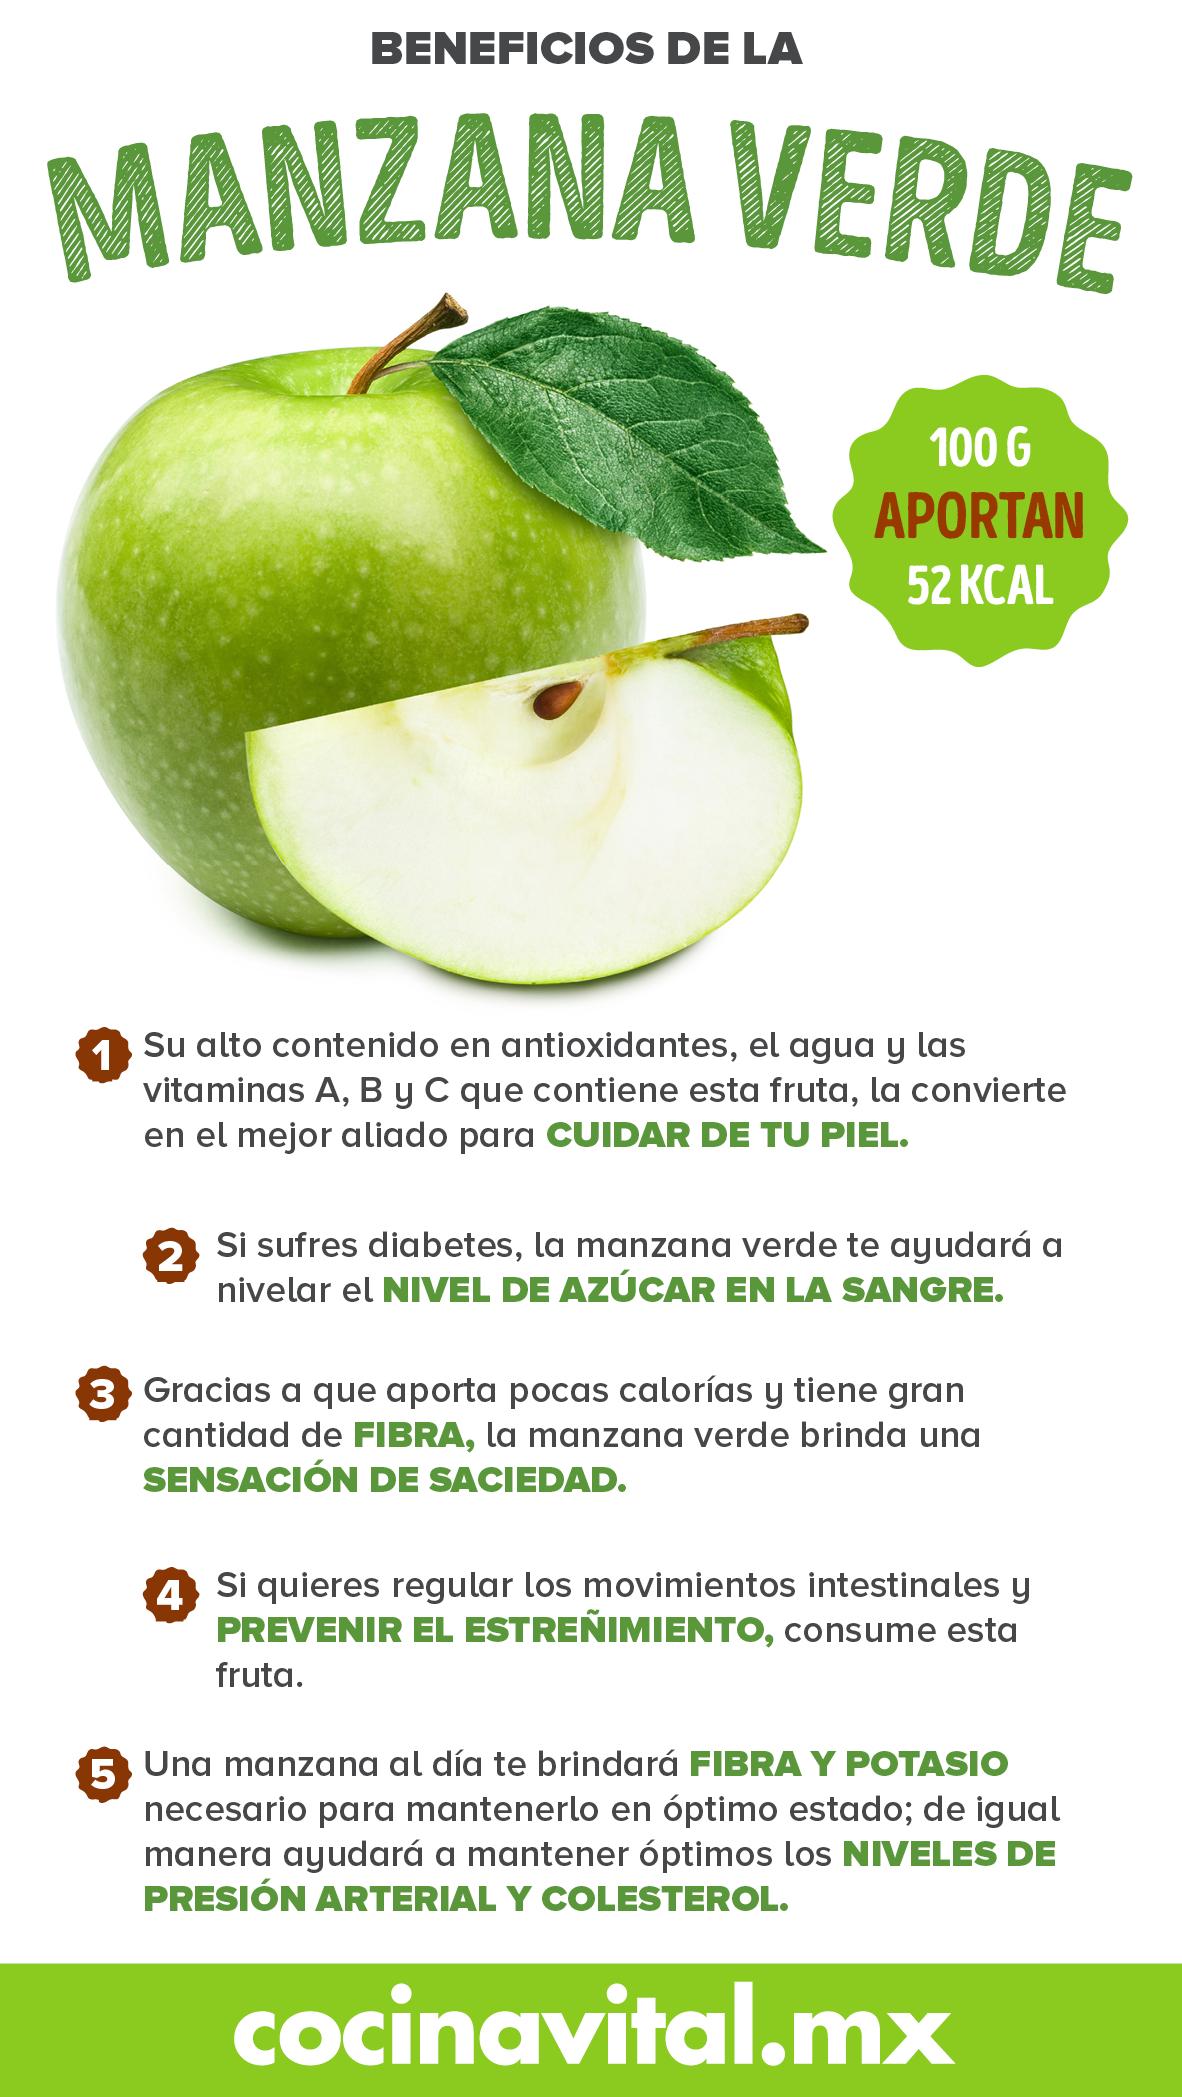 230 Ideas De Beneficios De Frutas Beneficios De Alimentos Beneficios De La Fruta Frutas Y Verduras Beneficios